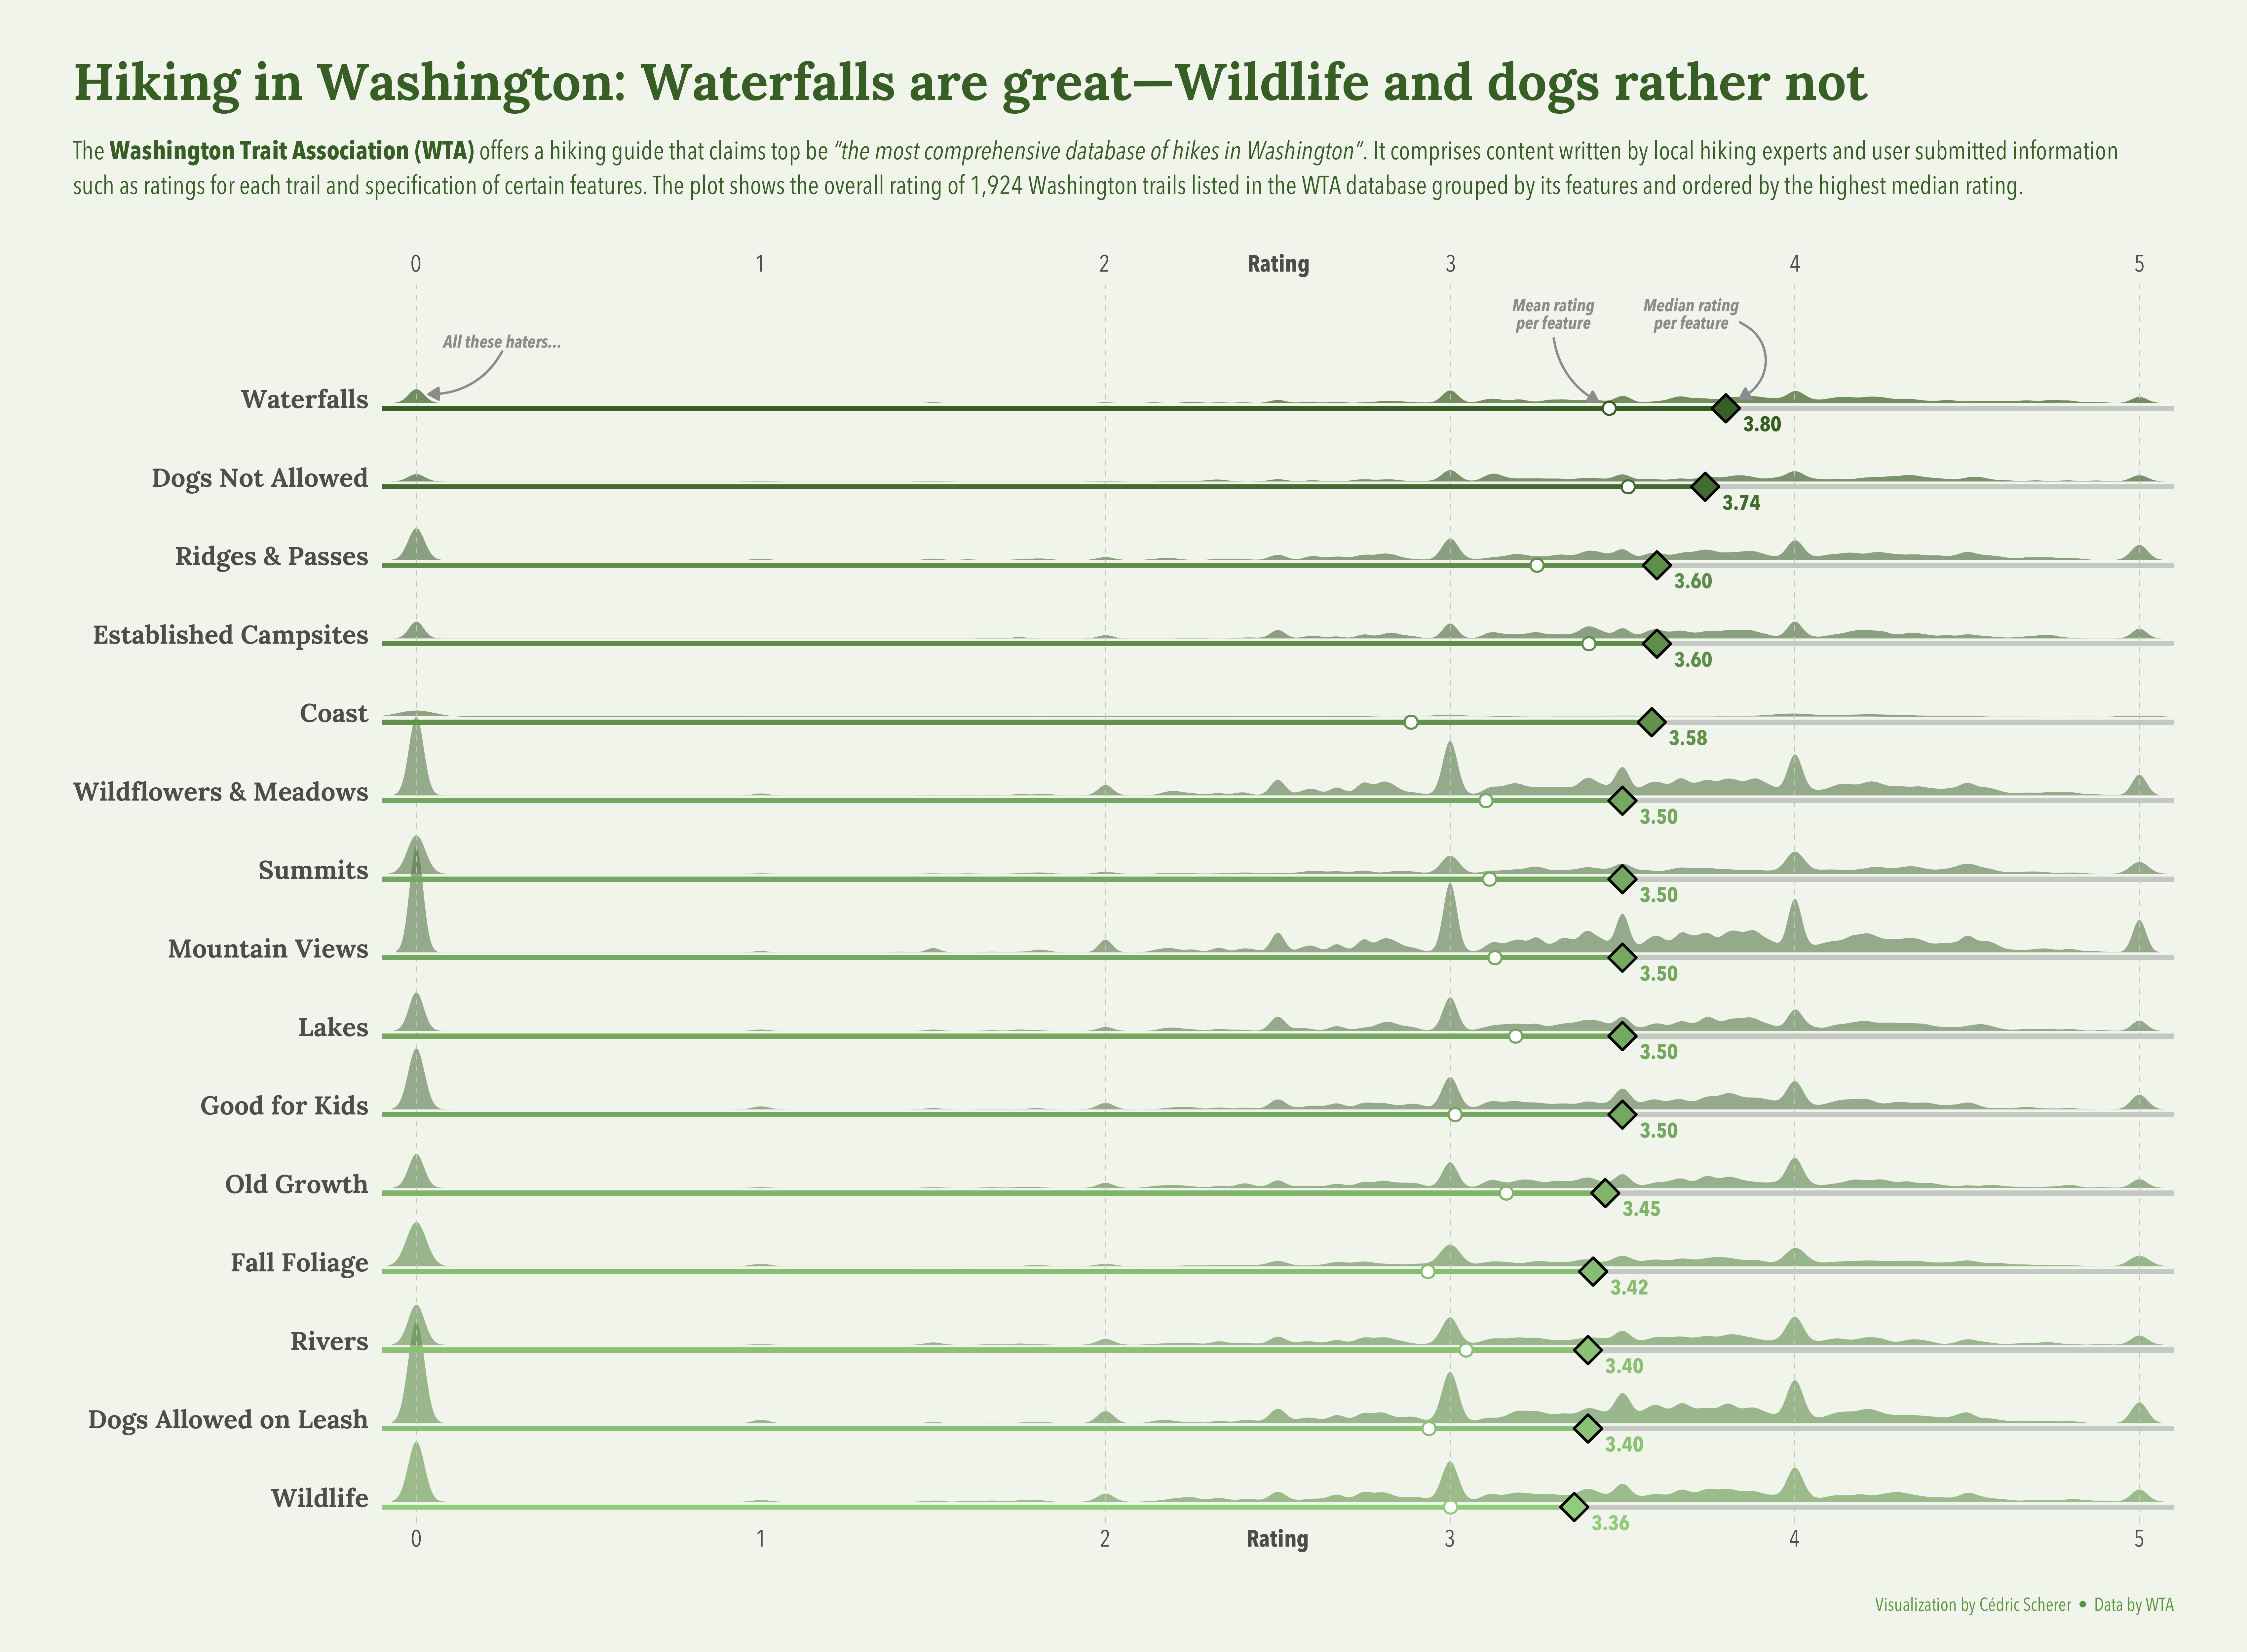 ./plots/2020_48/2020_48_WashingtonTrails.png